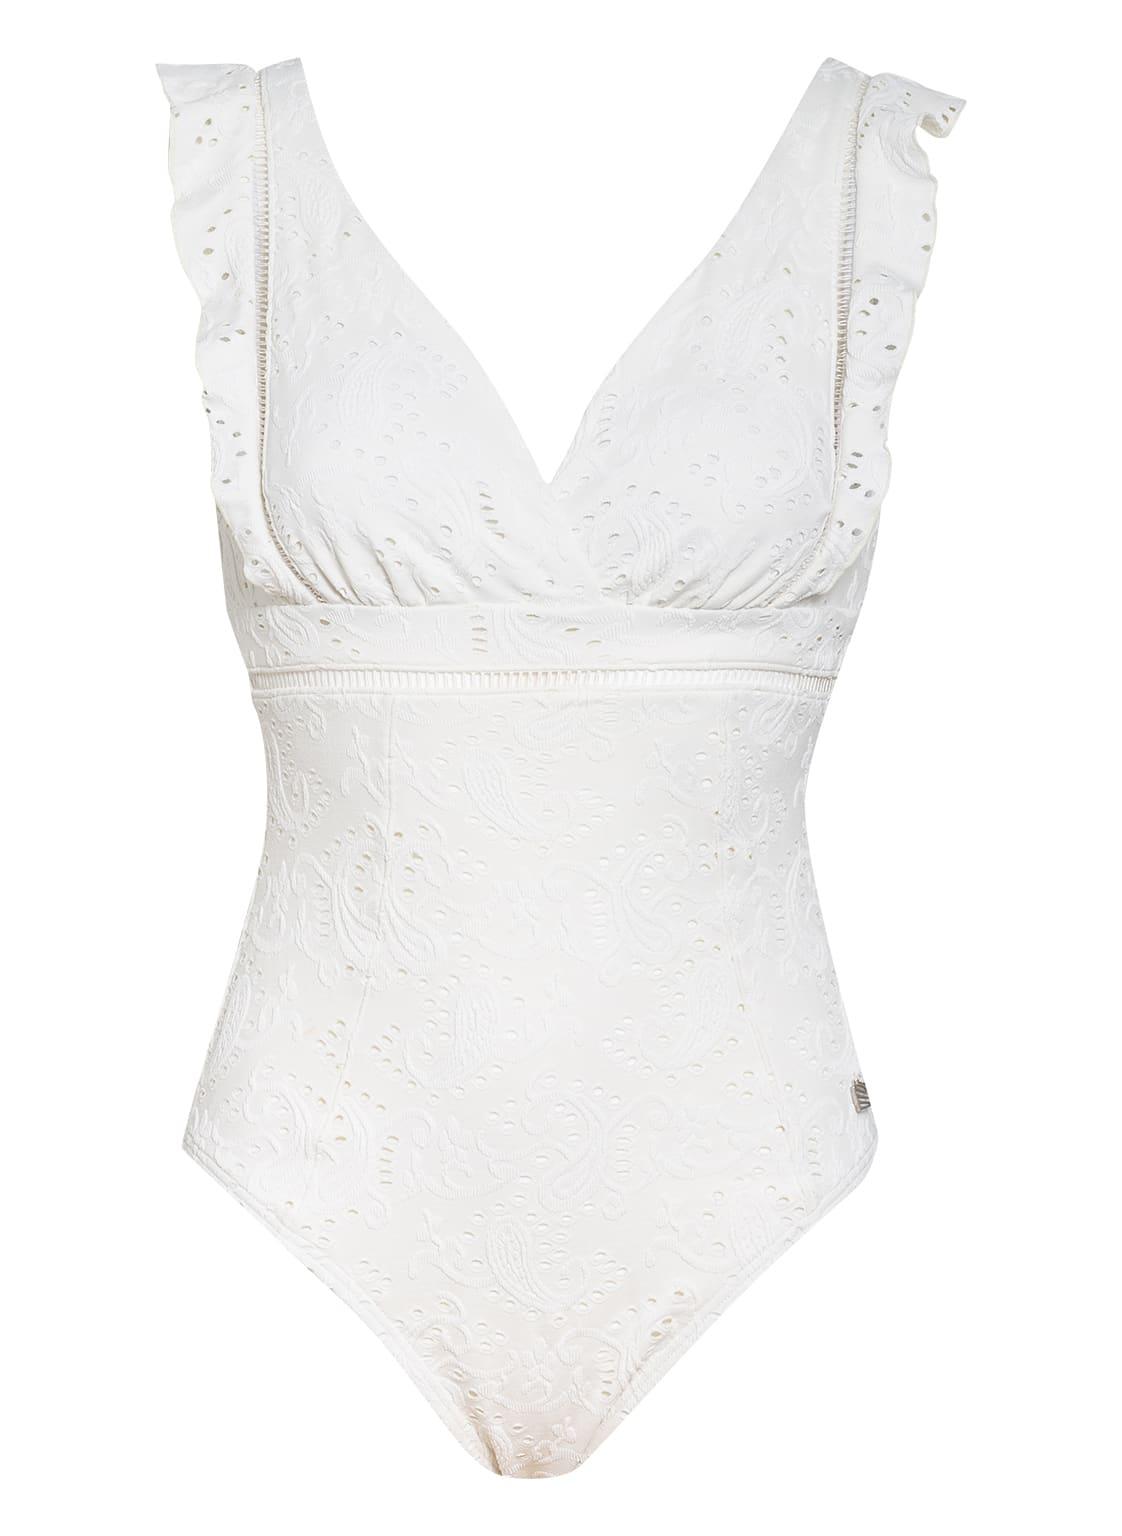 Image of Beachlife Badeanzug Blanc De Blanc weiss